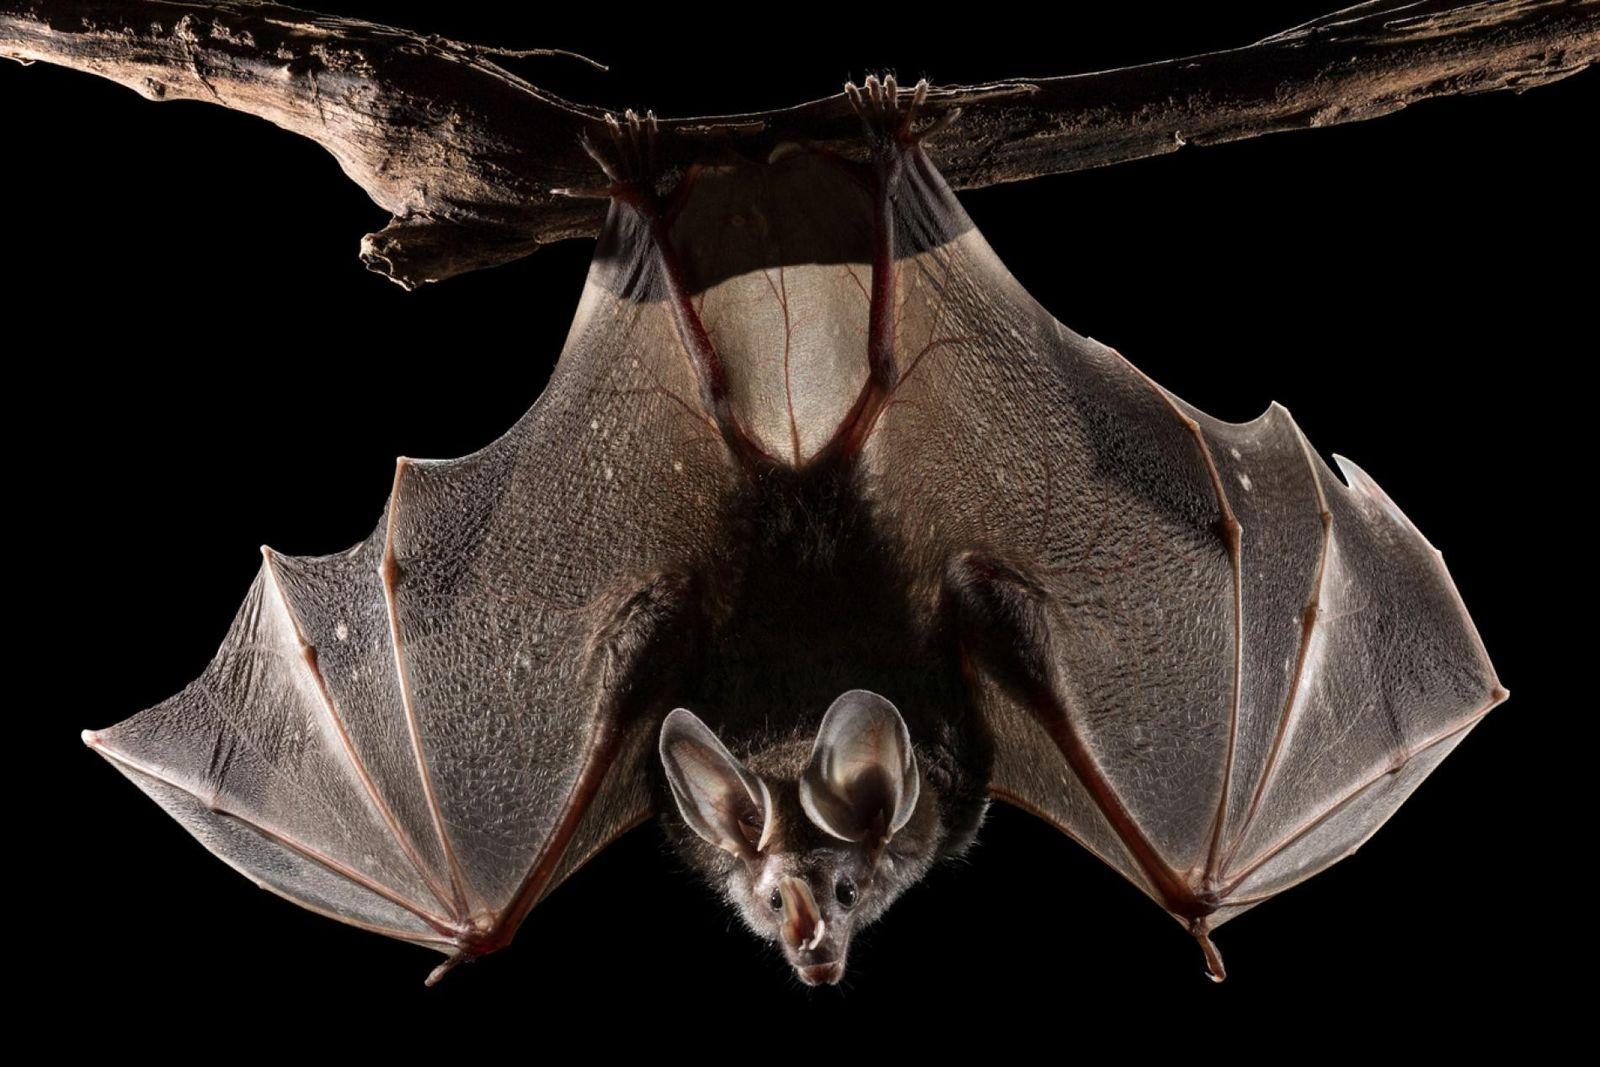 Con todos sus sentidos agudizados, un falso vampiro cuelga de una rama antes de tomar vuelo. ...